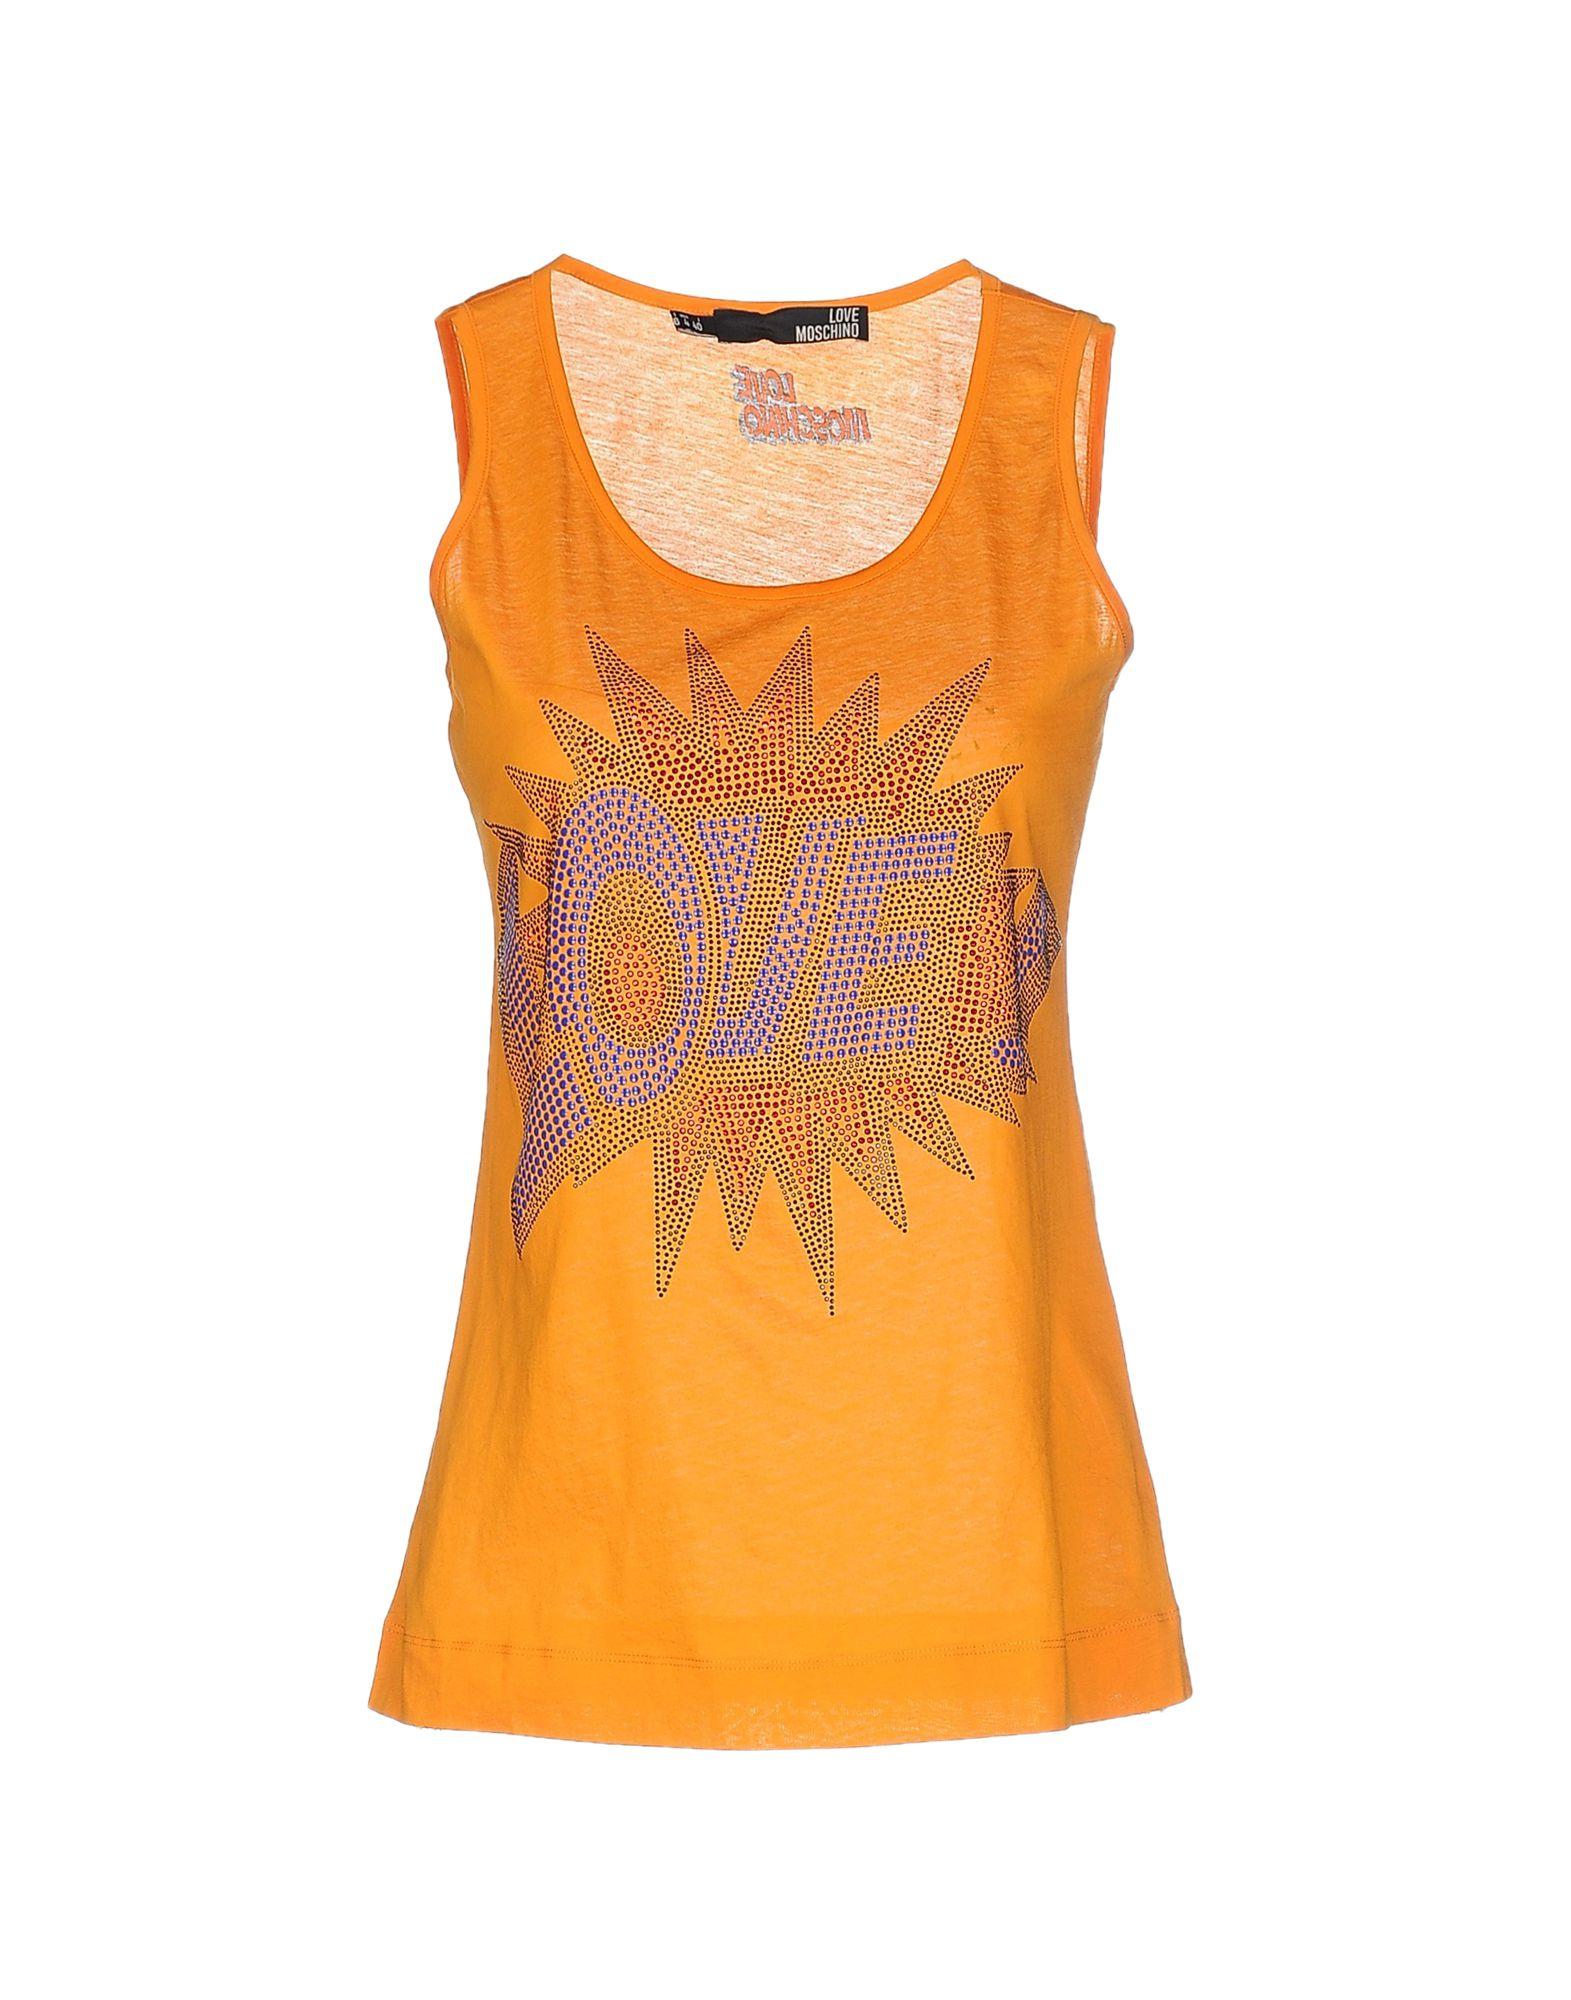 lyst love moschino vest in orange. Black Bedroom Furniture Sets. Home Design Ideas